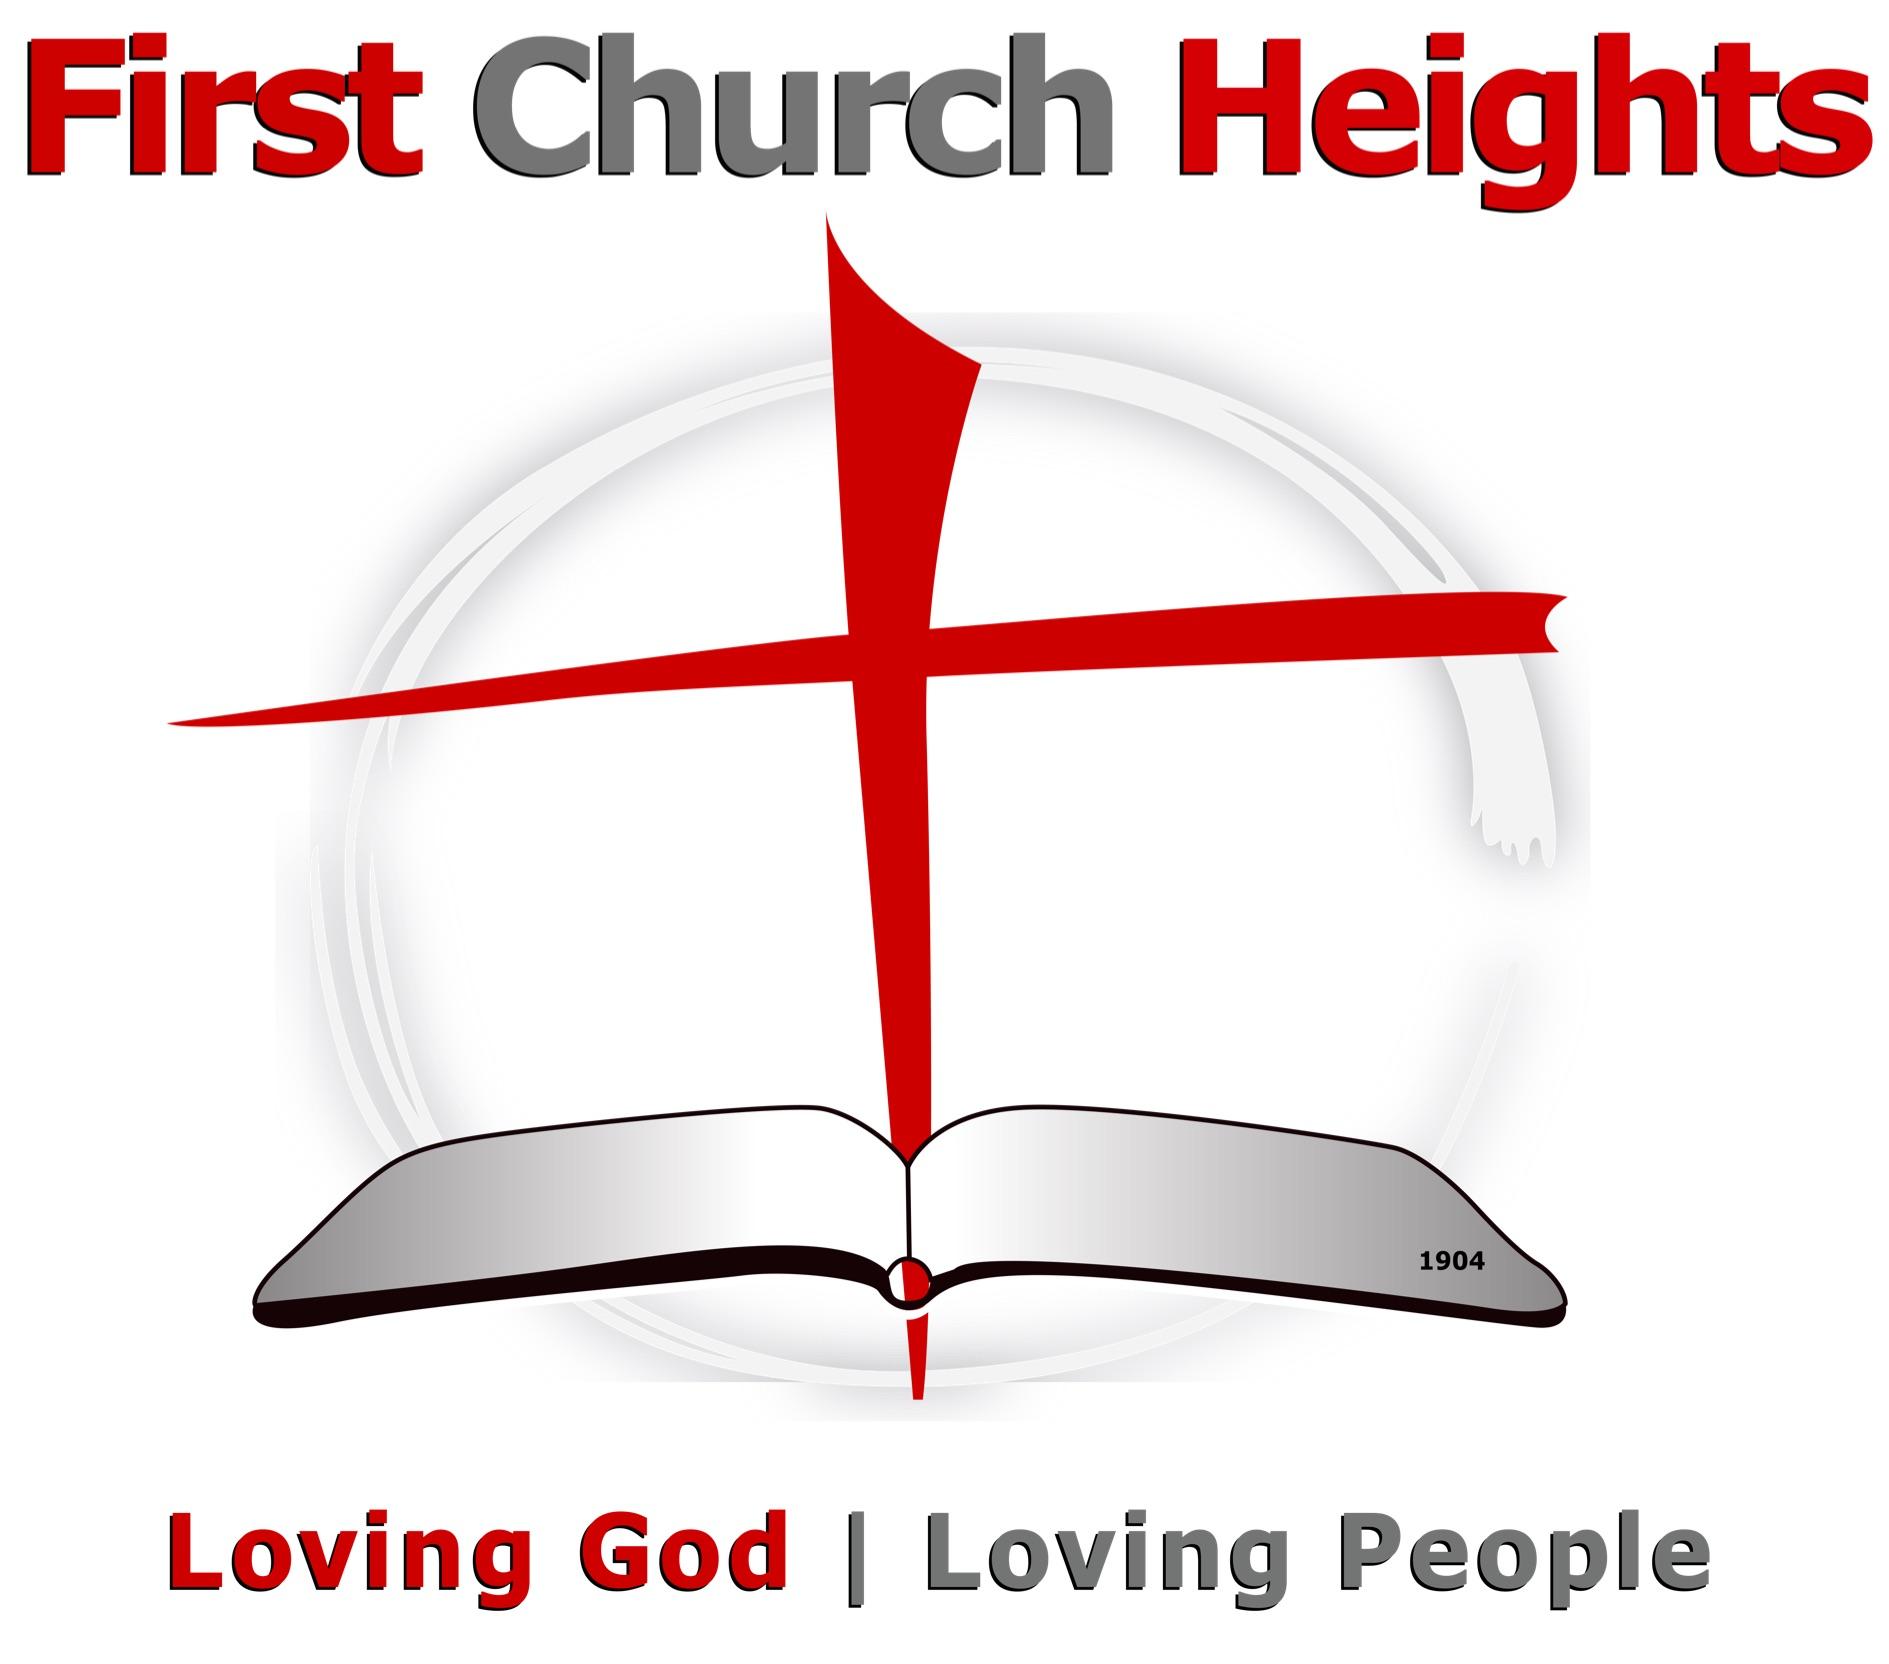 First Church Heights, SBC